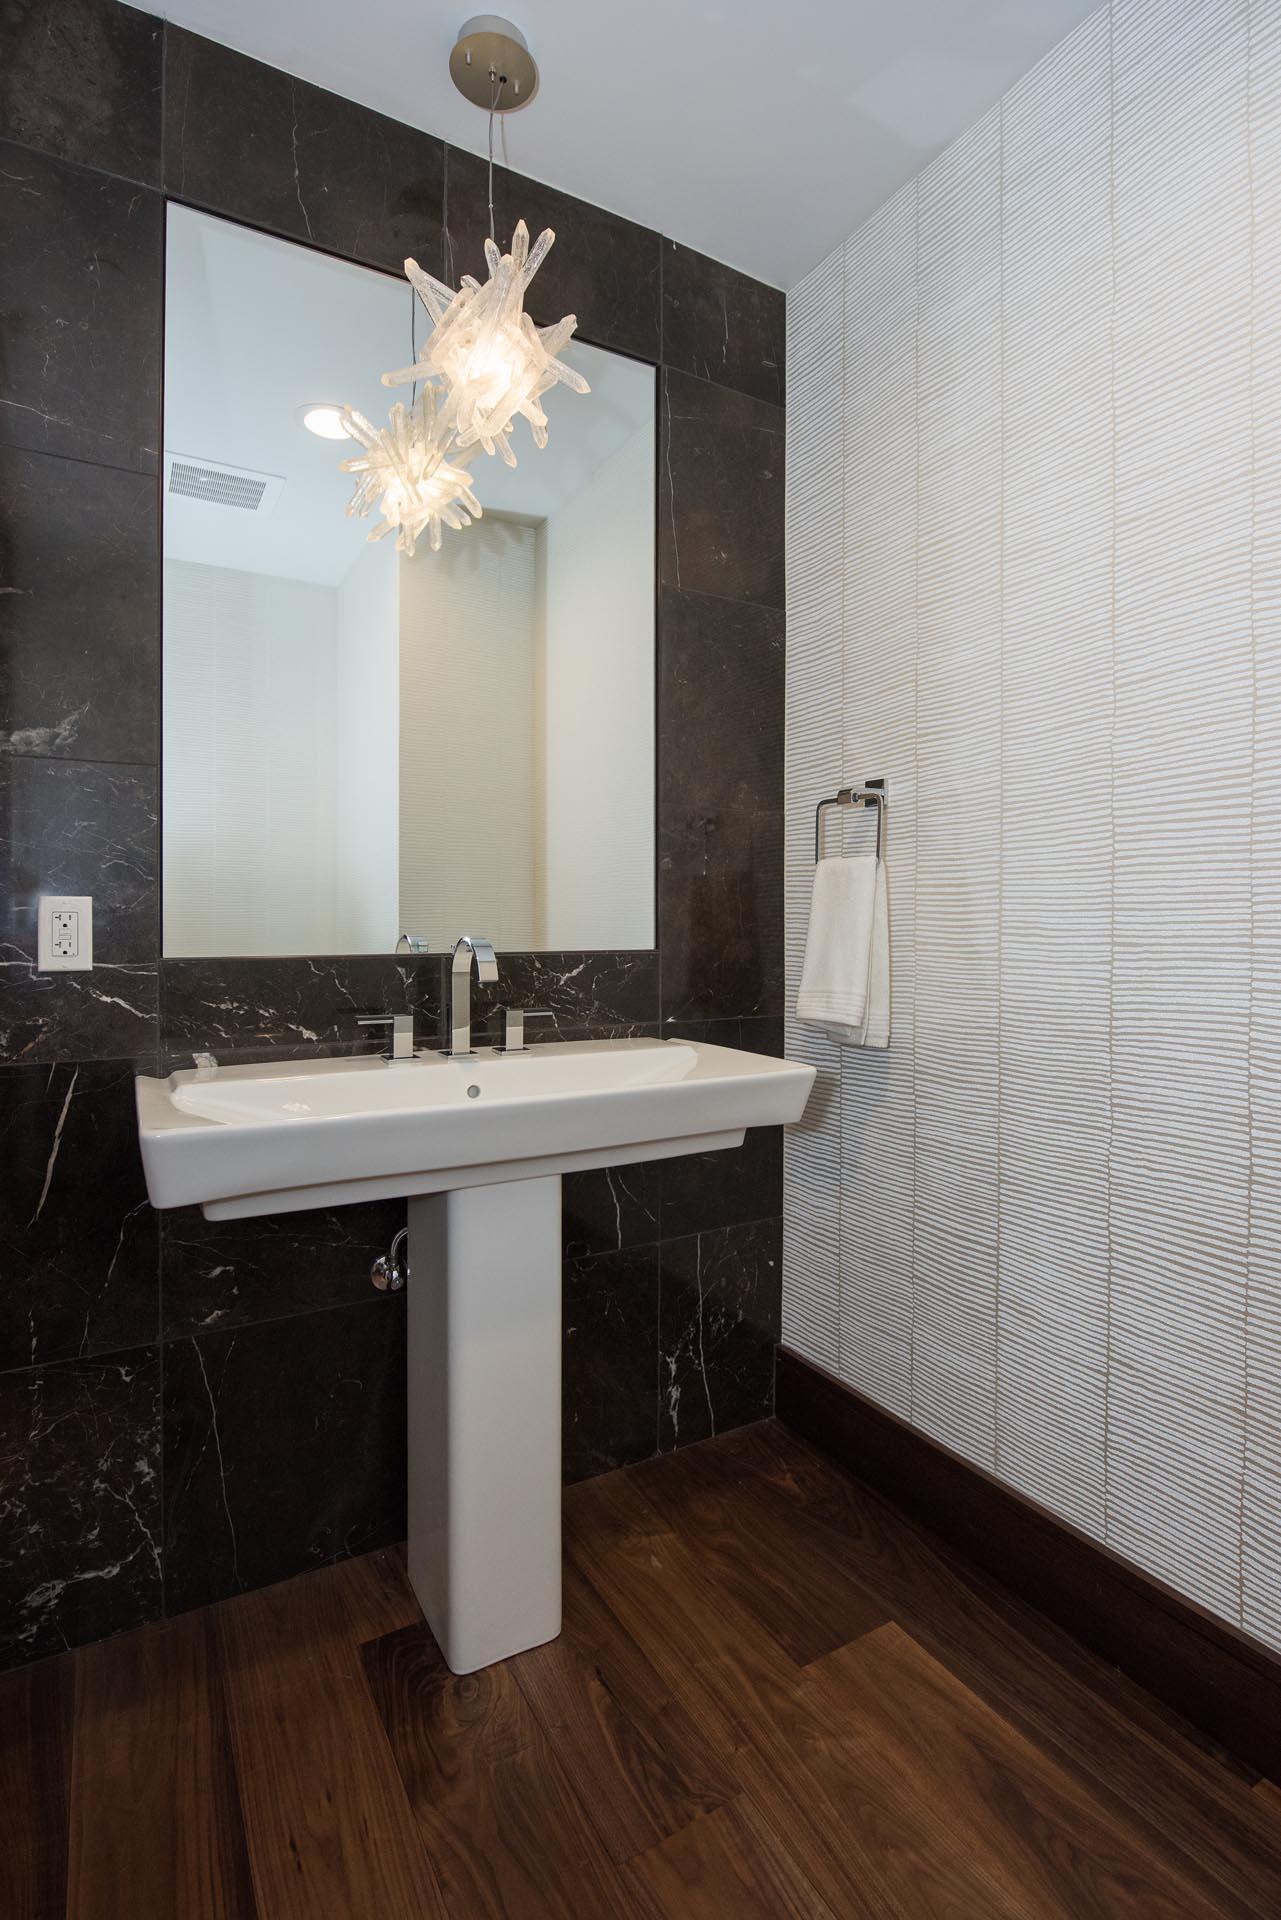 Bathroom Sink Design | H Residence | Midland, MI